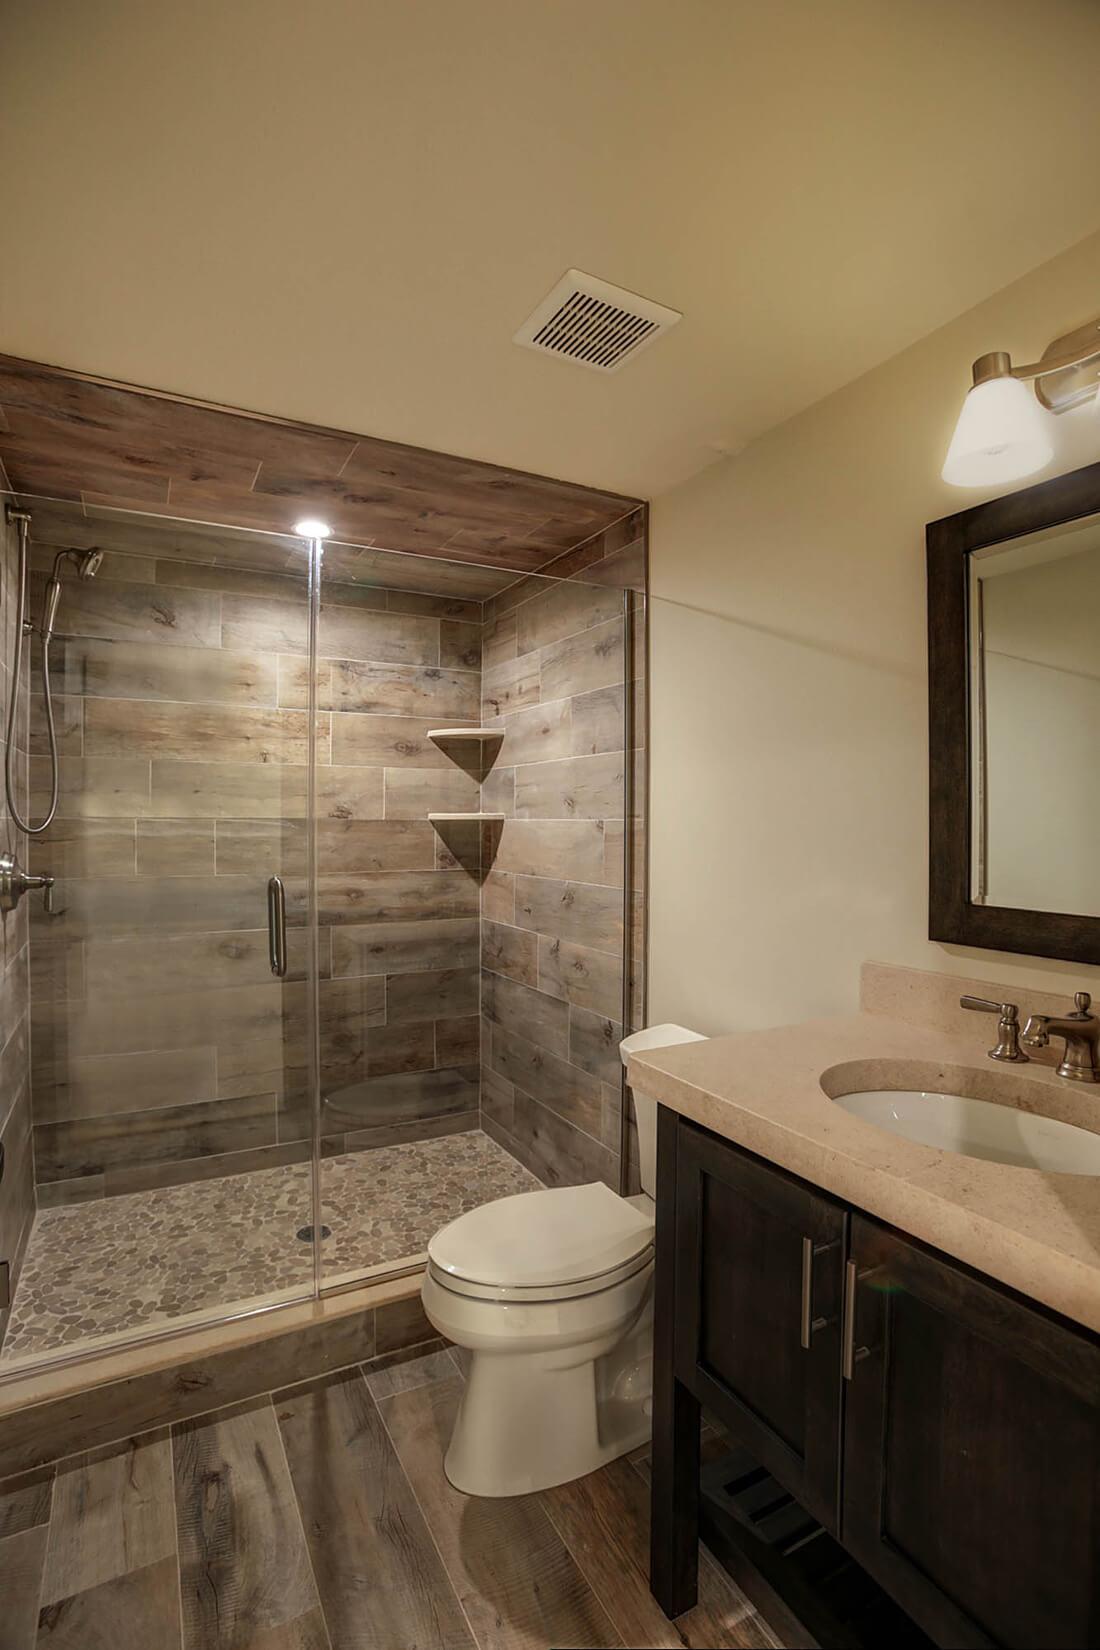 221 Golf Edge Basement Bathroom